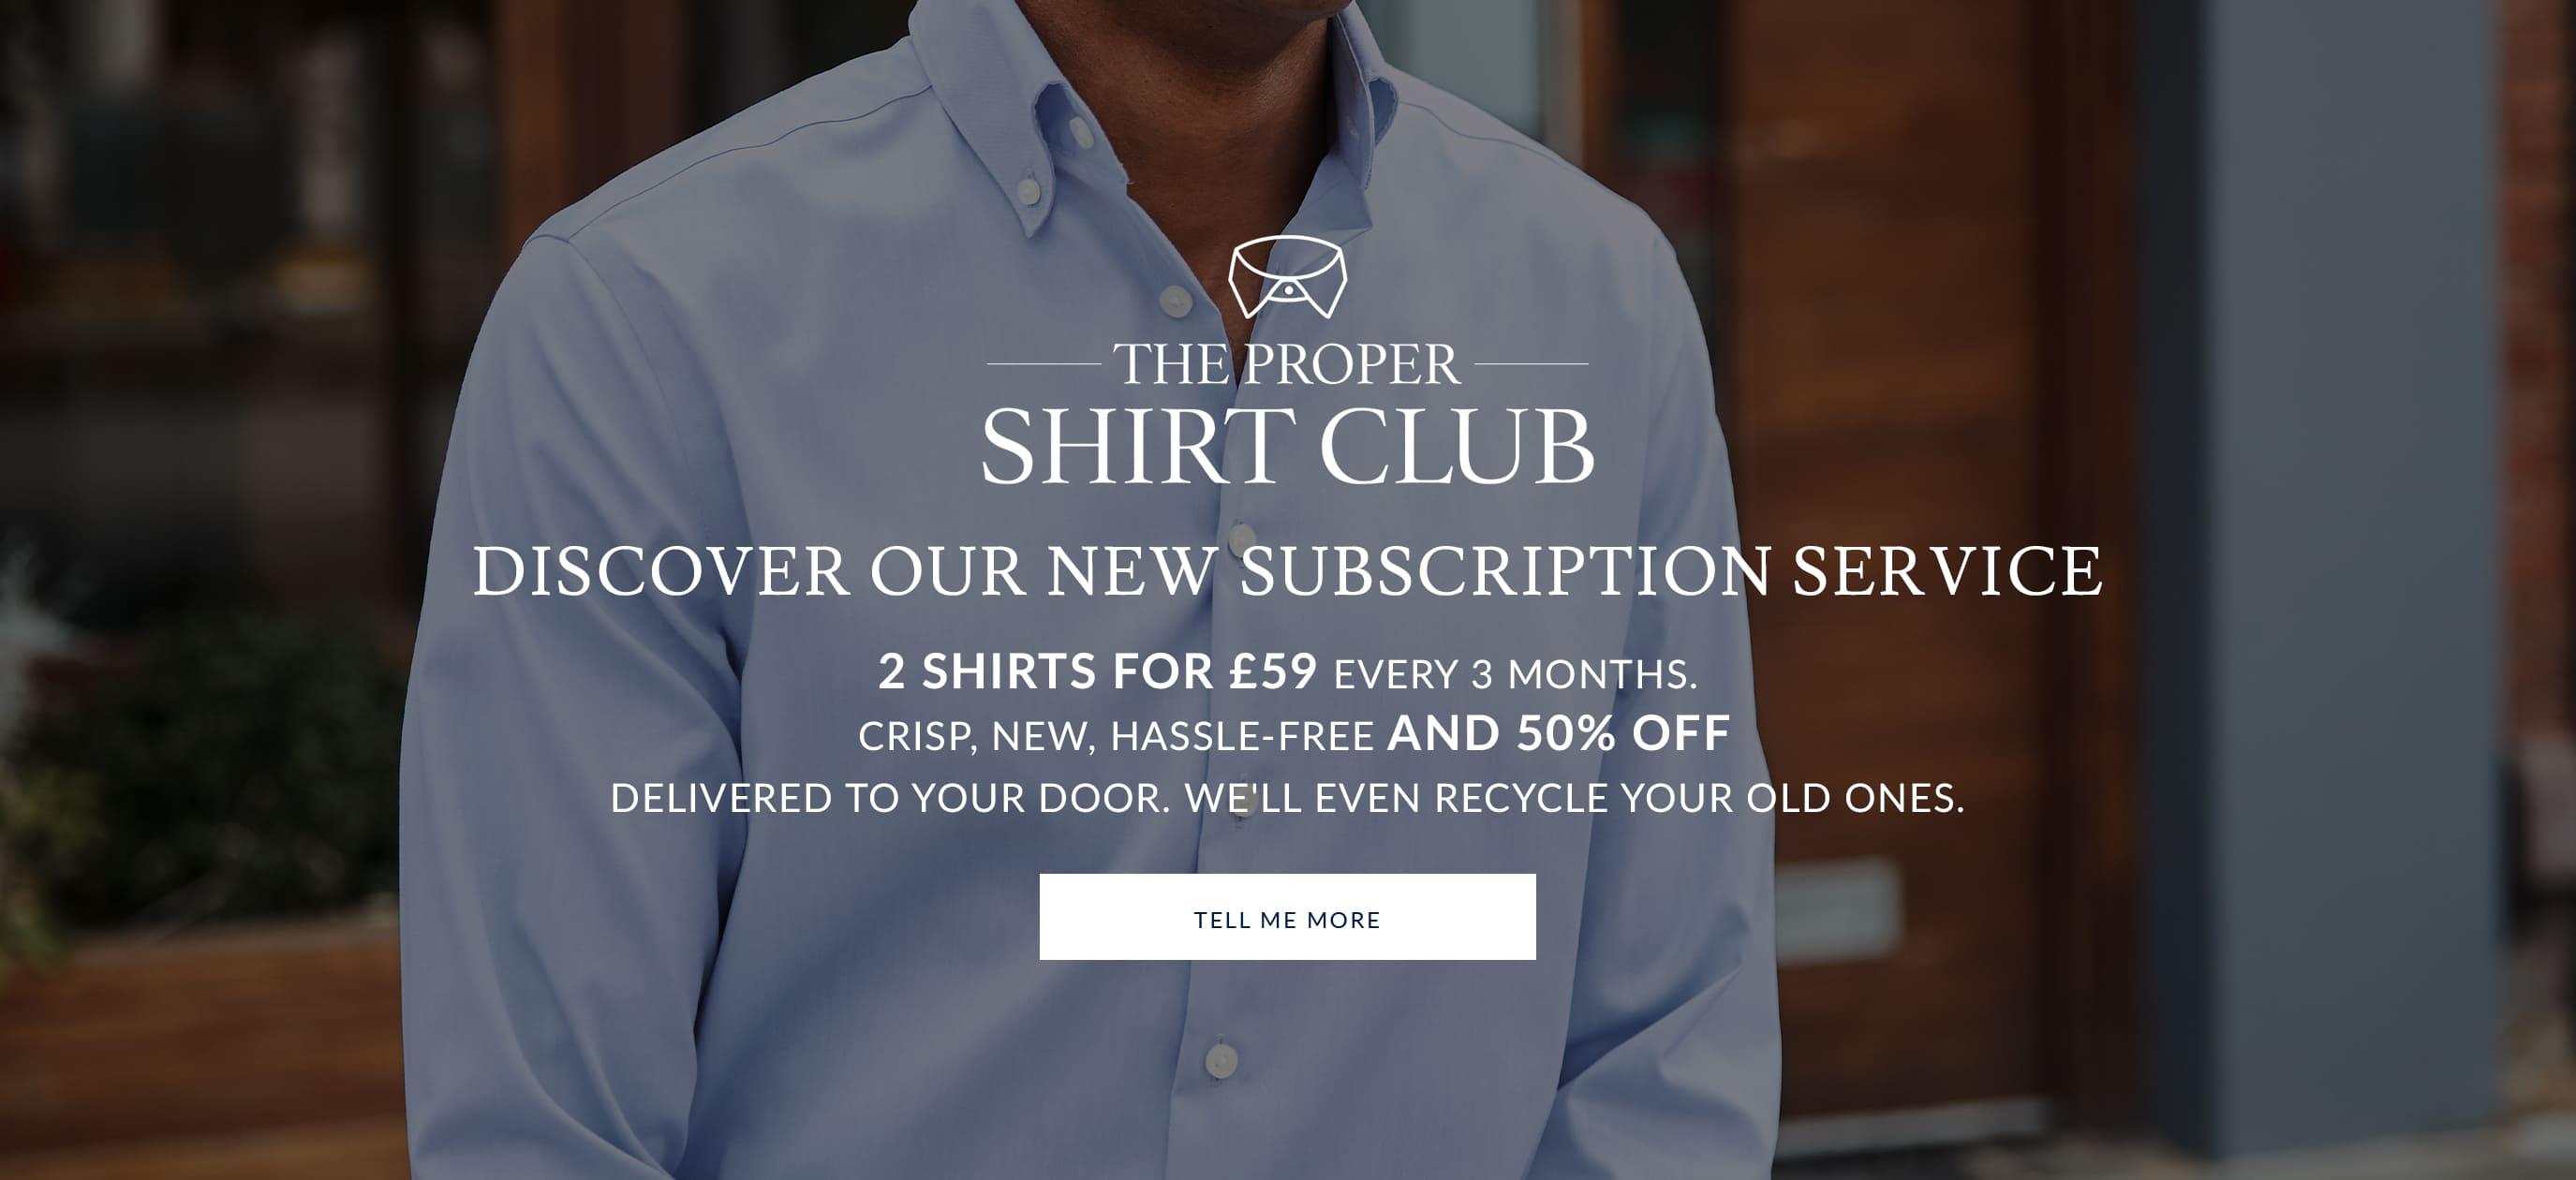 a white and a blue shirt